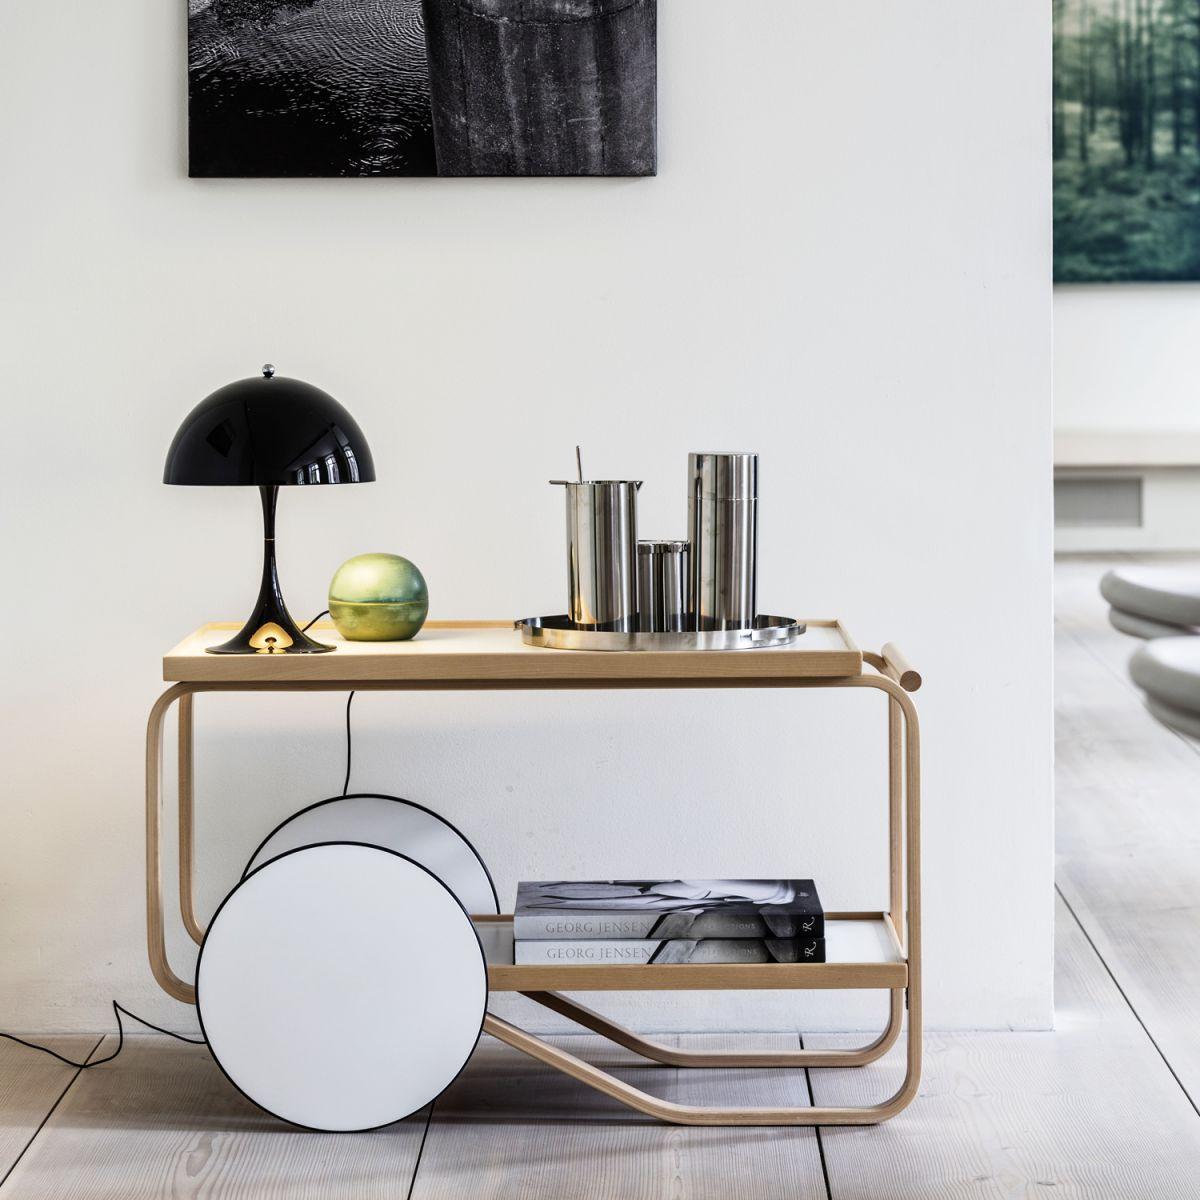 louis poulsen panthella mini tischleuchte schwarz a ebay. Black Bedroom Furniture Sets. Home Design Ideas